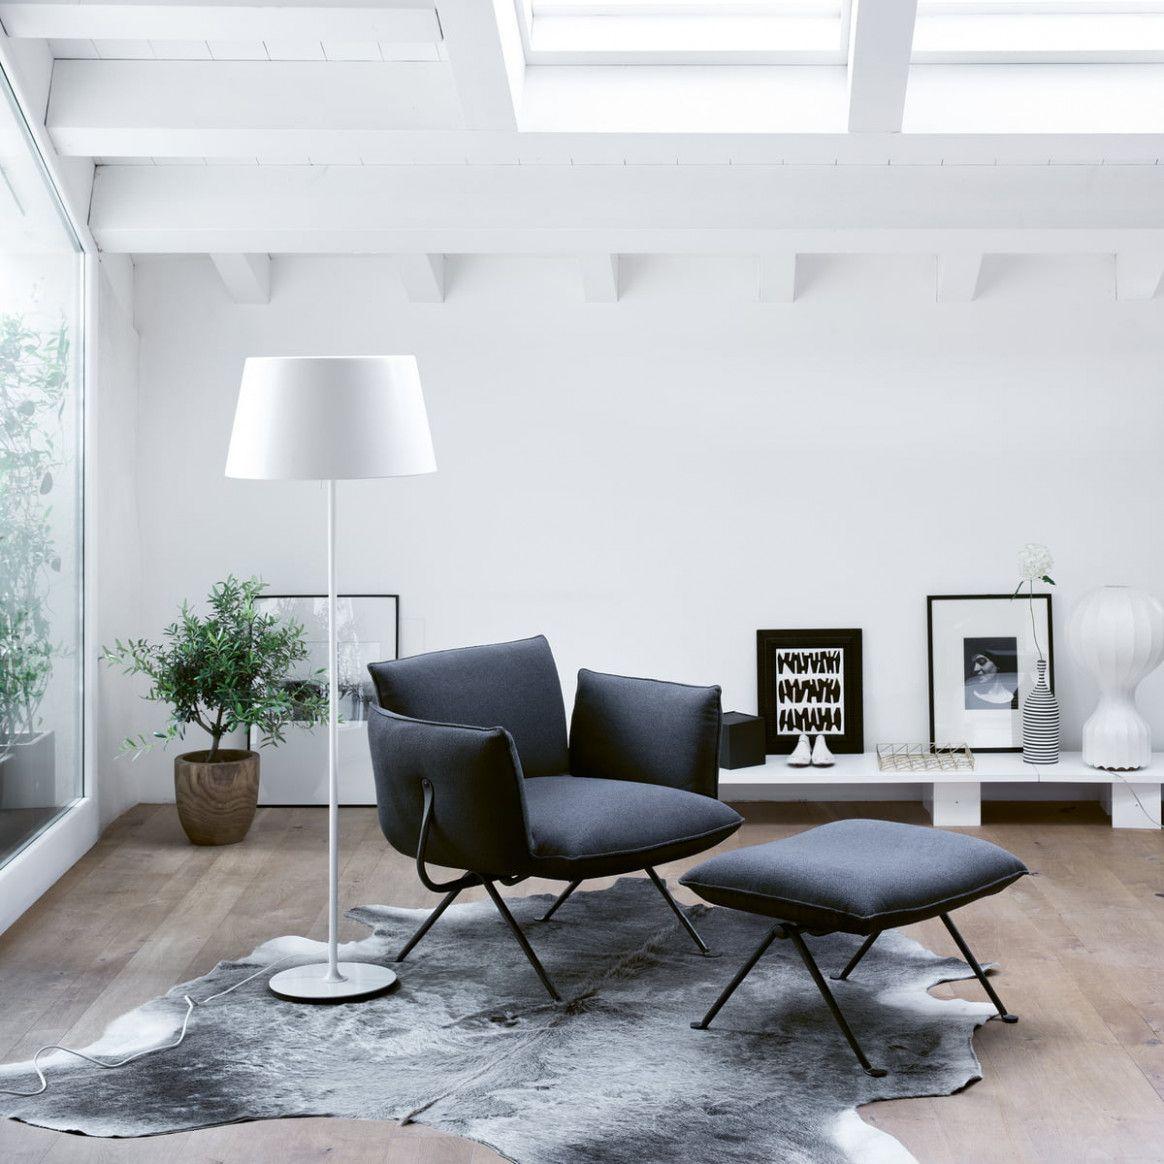 15 wohnzimmer sessel in 2020 | wohnzimmer sessel, sessel